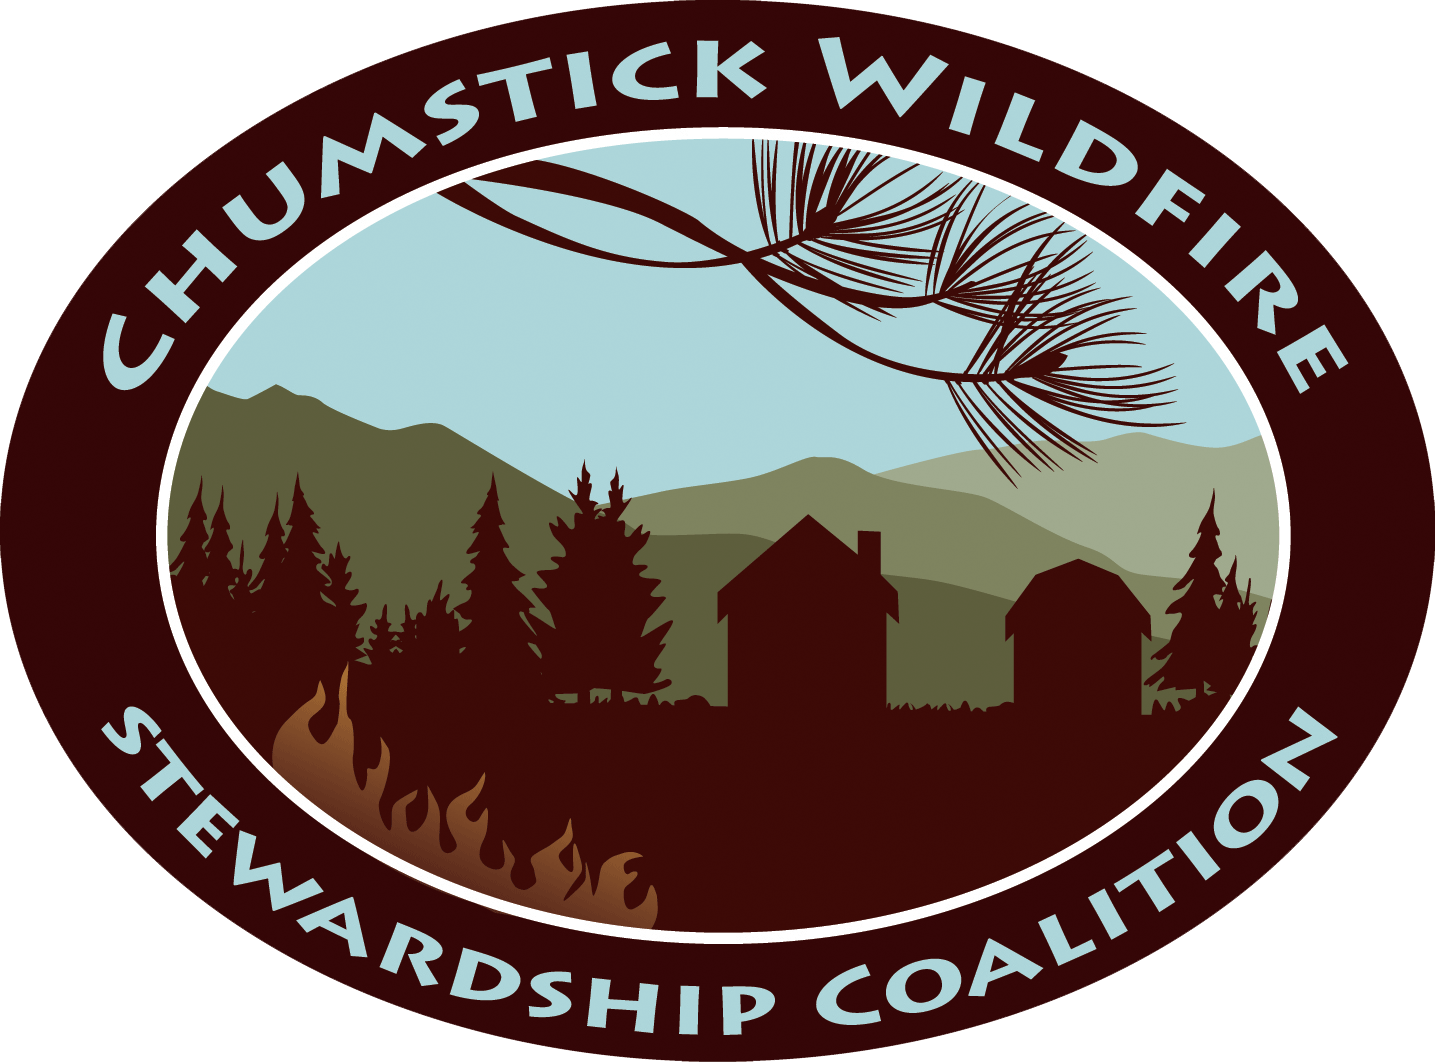 Chumstick Wildfire Stewardship Coalition Logo